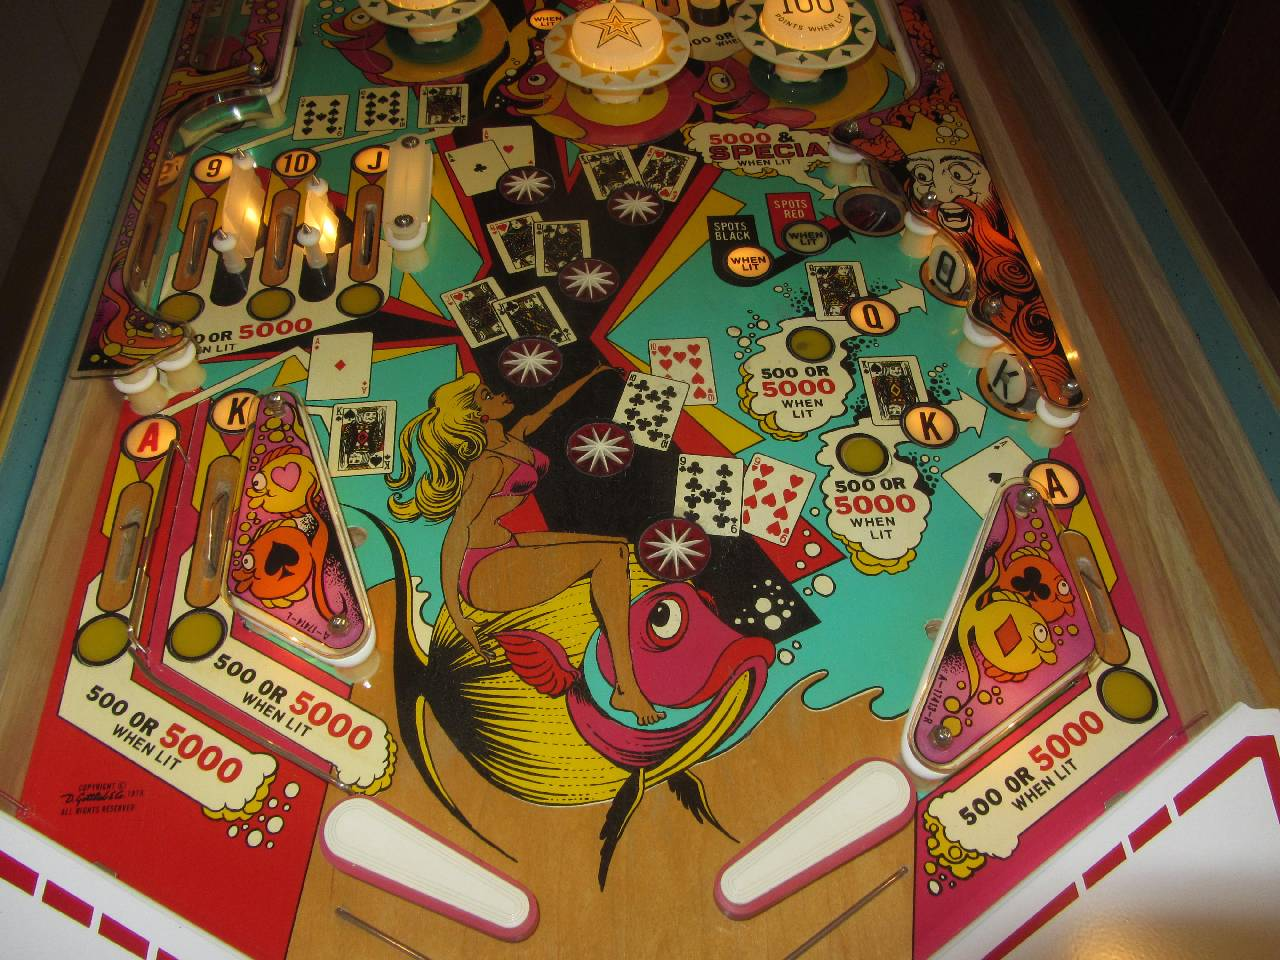 Gottlieb Hit The Deck Pinball Machine 3 Pinballmania Llc